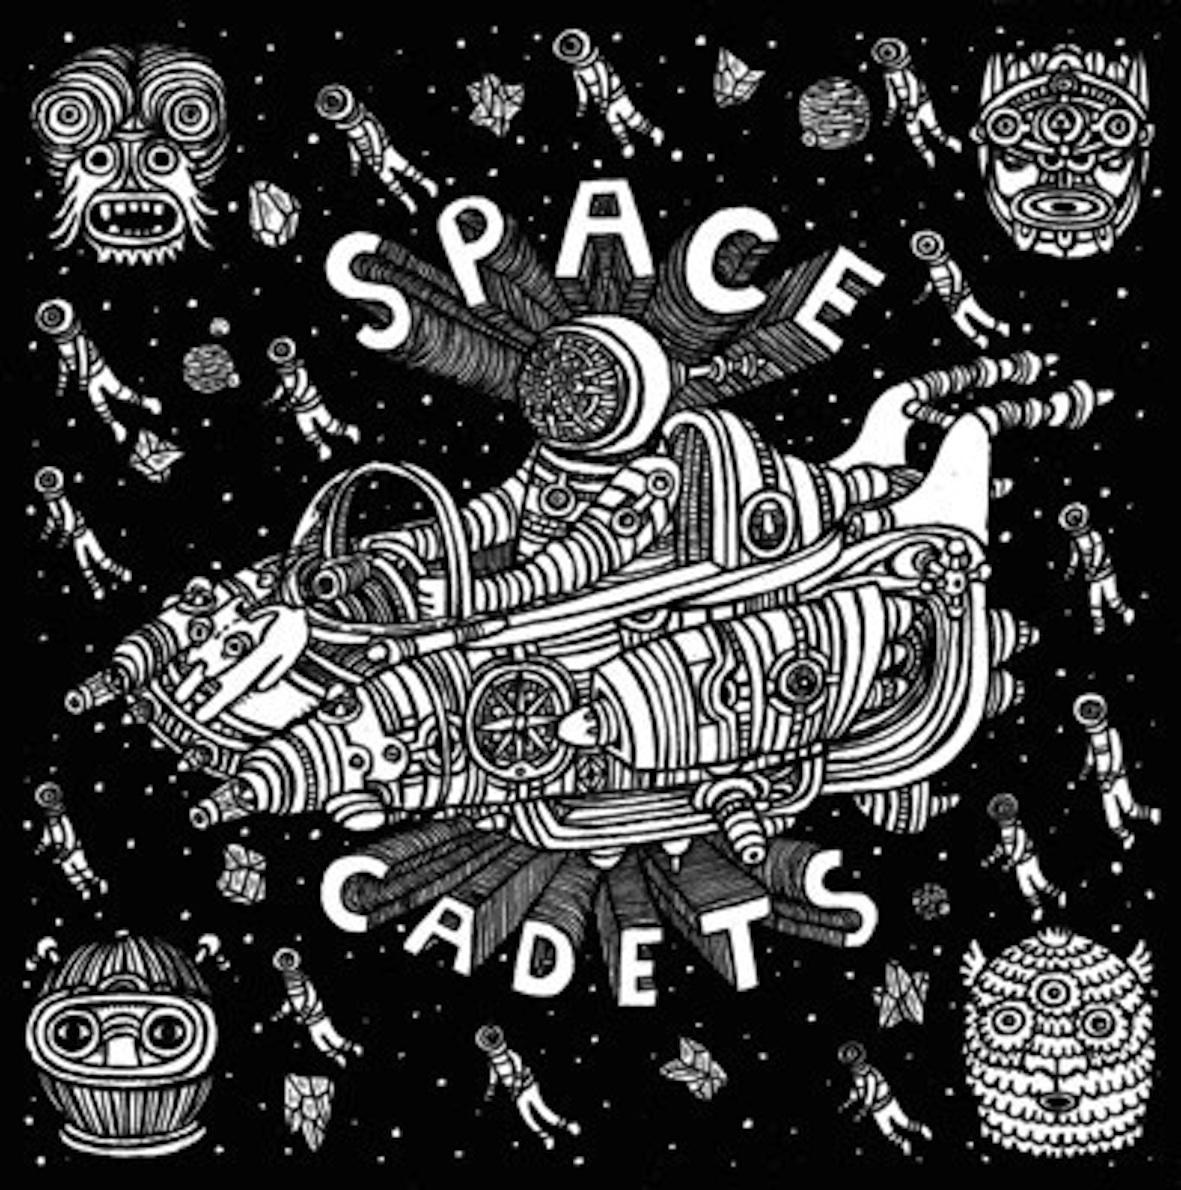 Reviews, Promo`d, Test Pressing, Dr Rob, Oak, Firebird, Space Cadets,